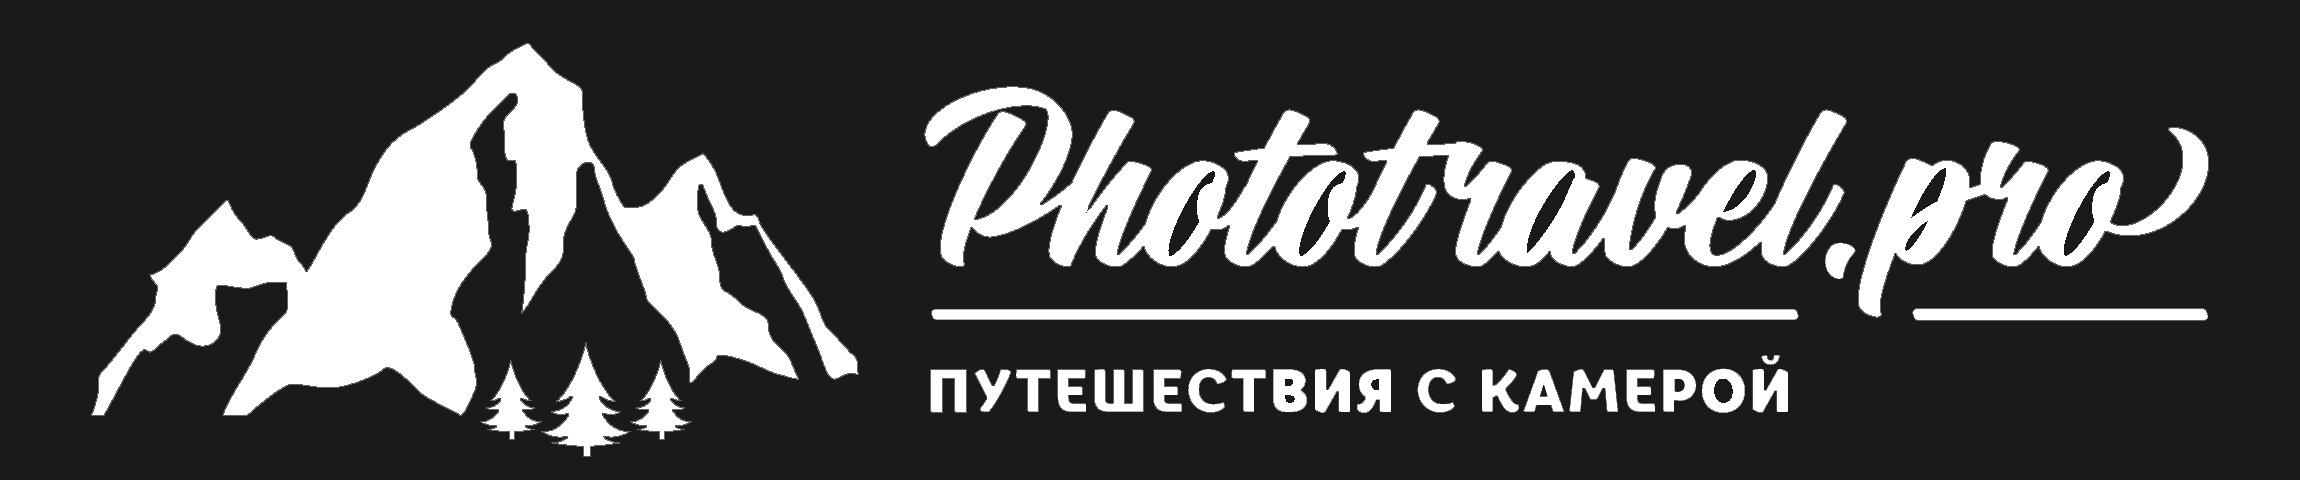 Phototravel.pro